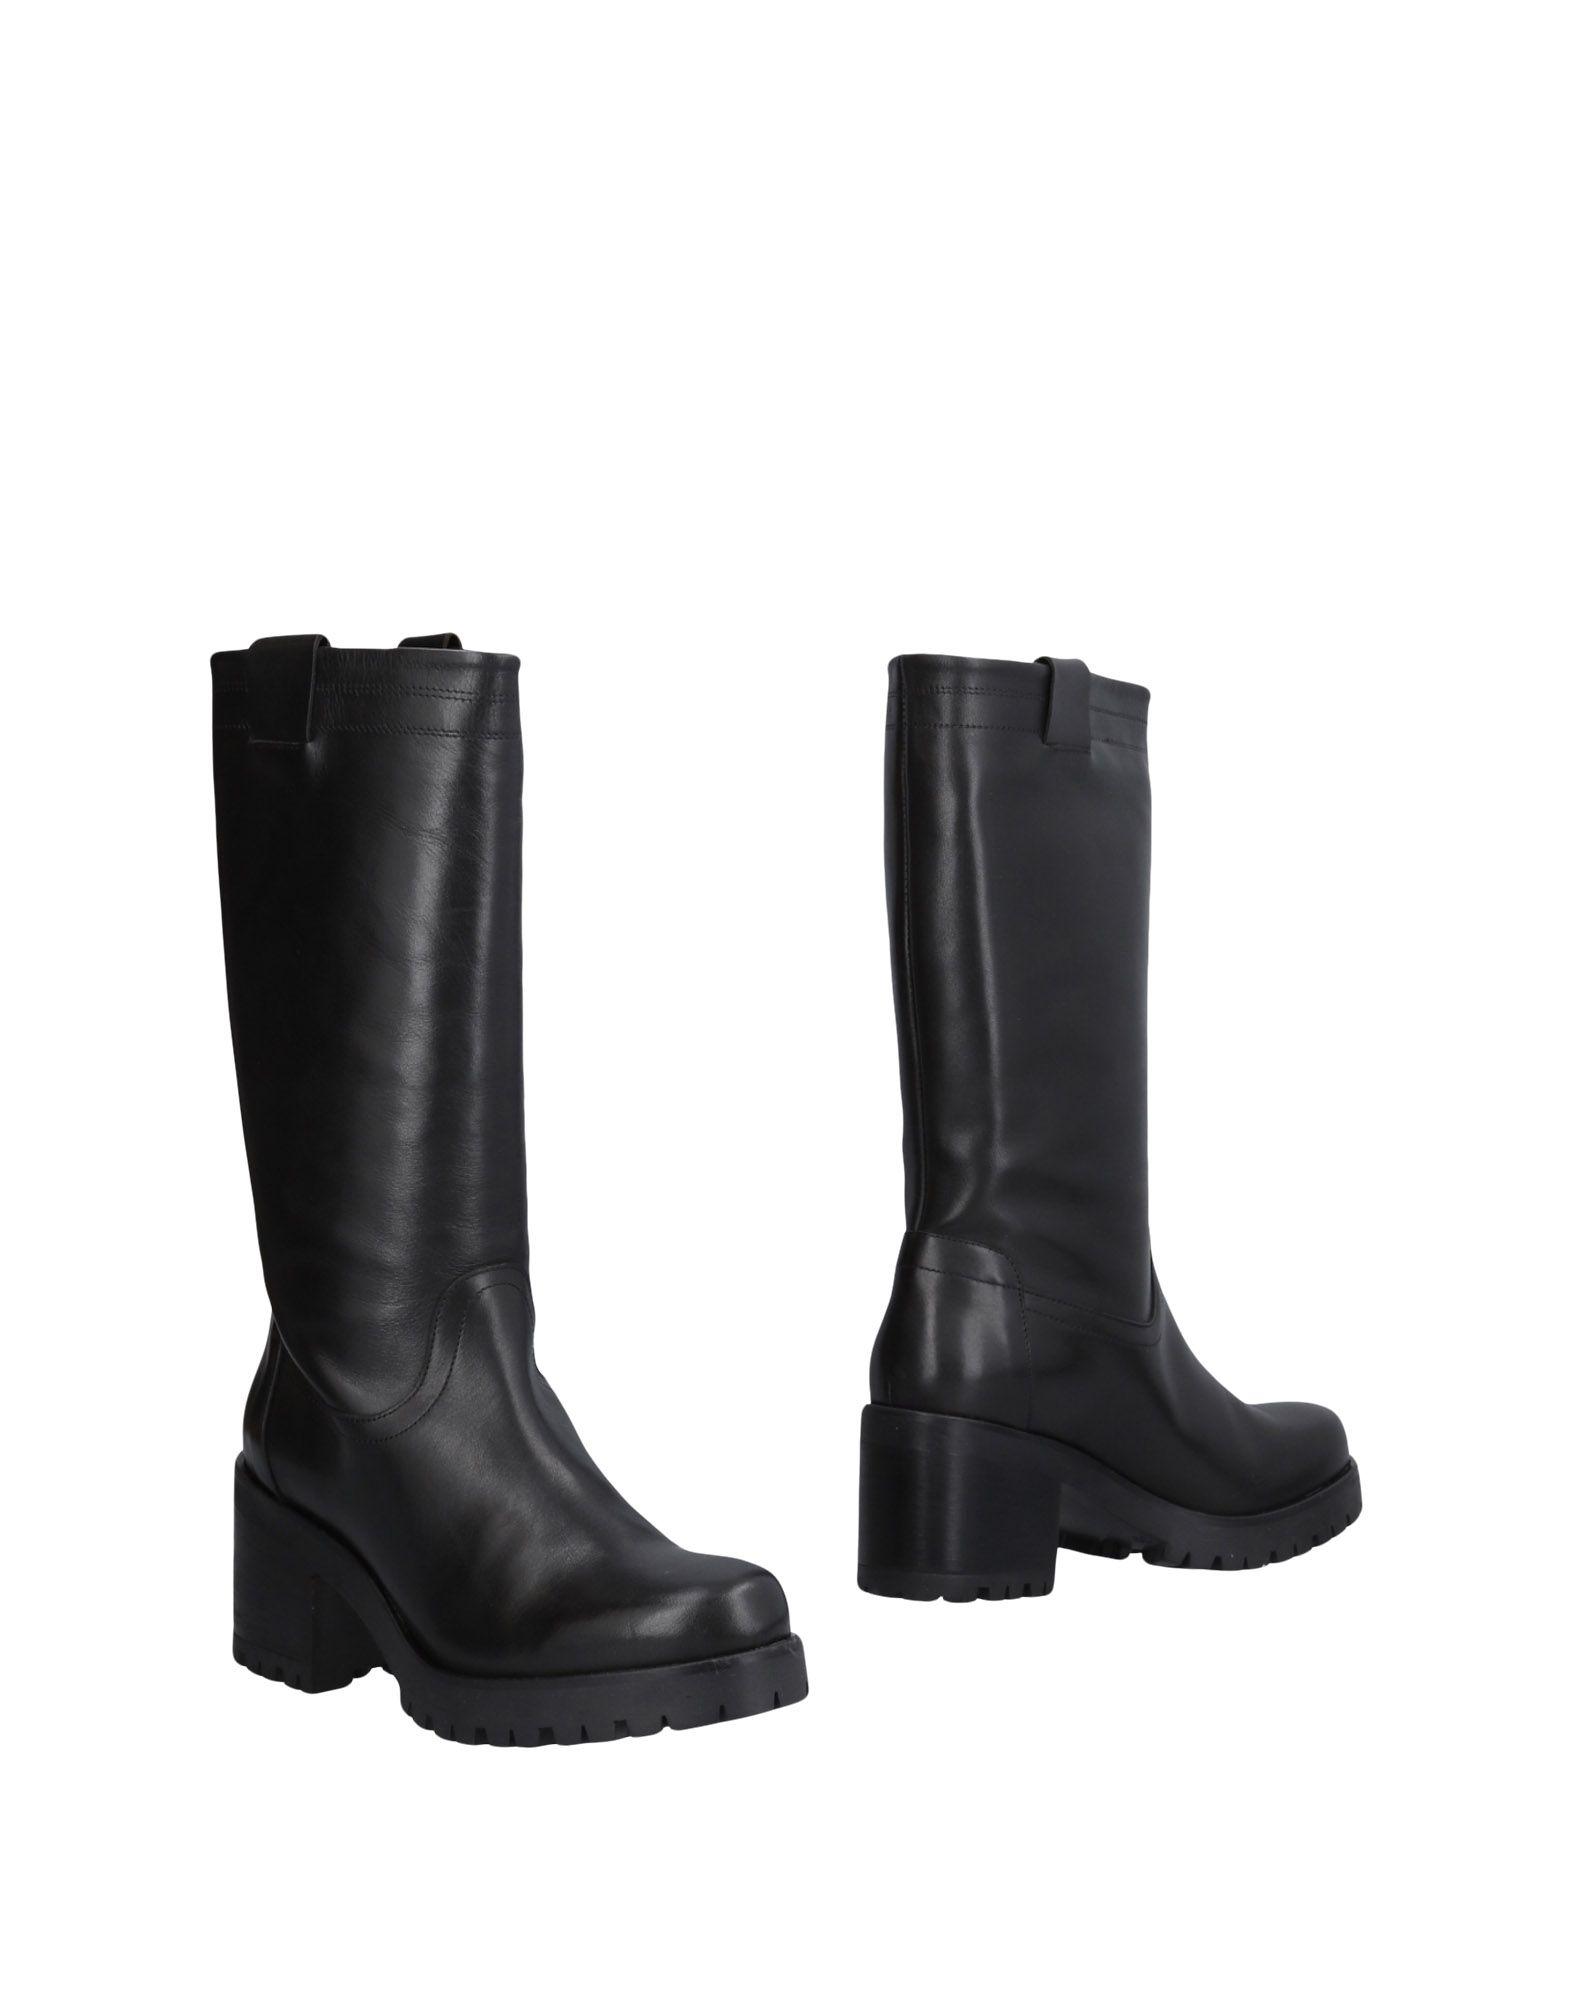 Stilvolle billige Schuhe Damen Archyve Stiefel Damen Schuhe  11488451TP e03630